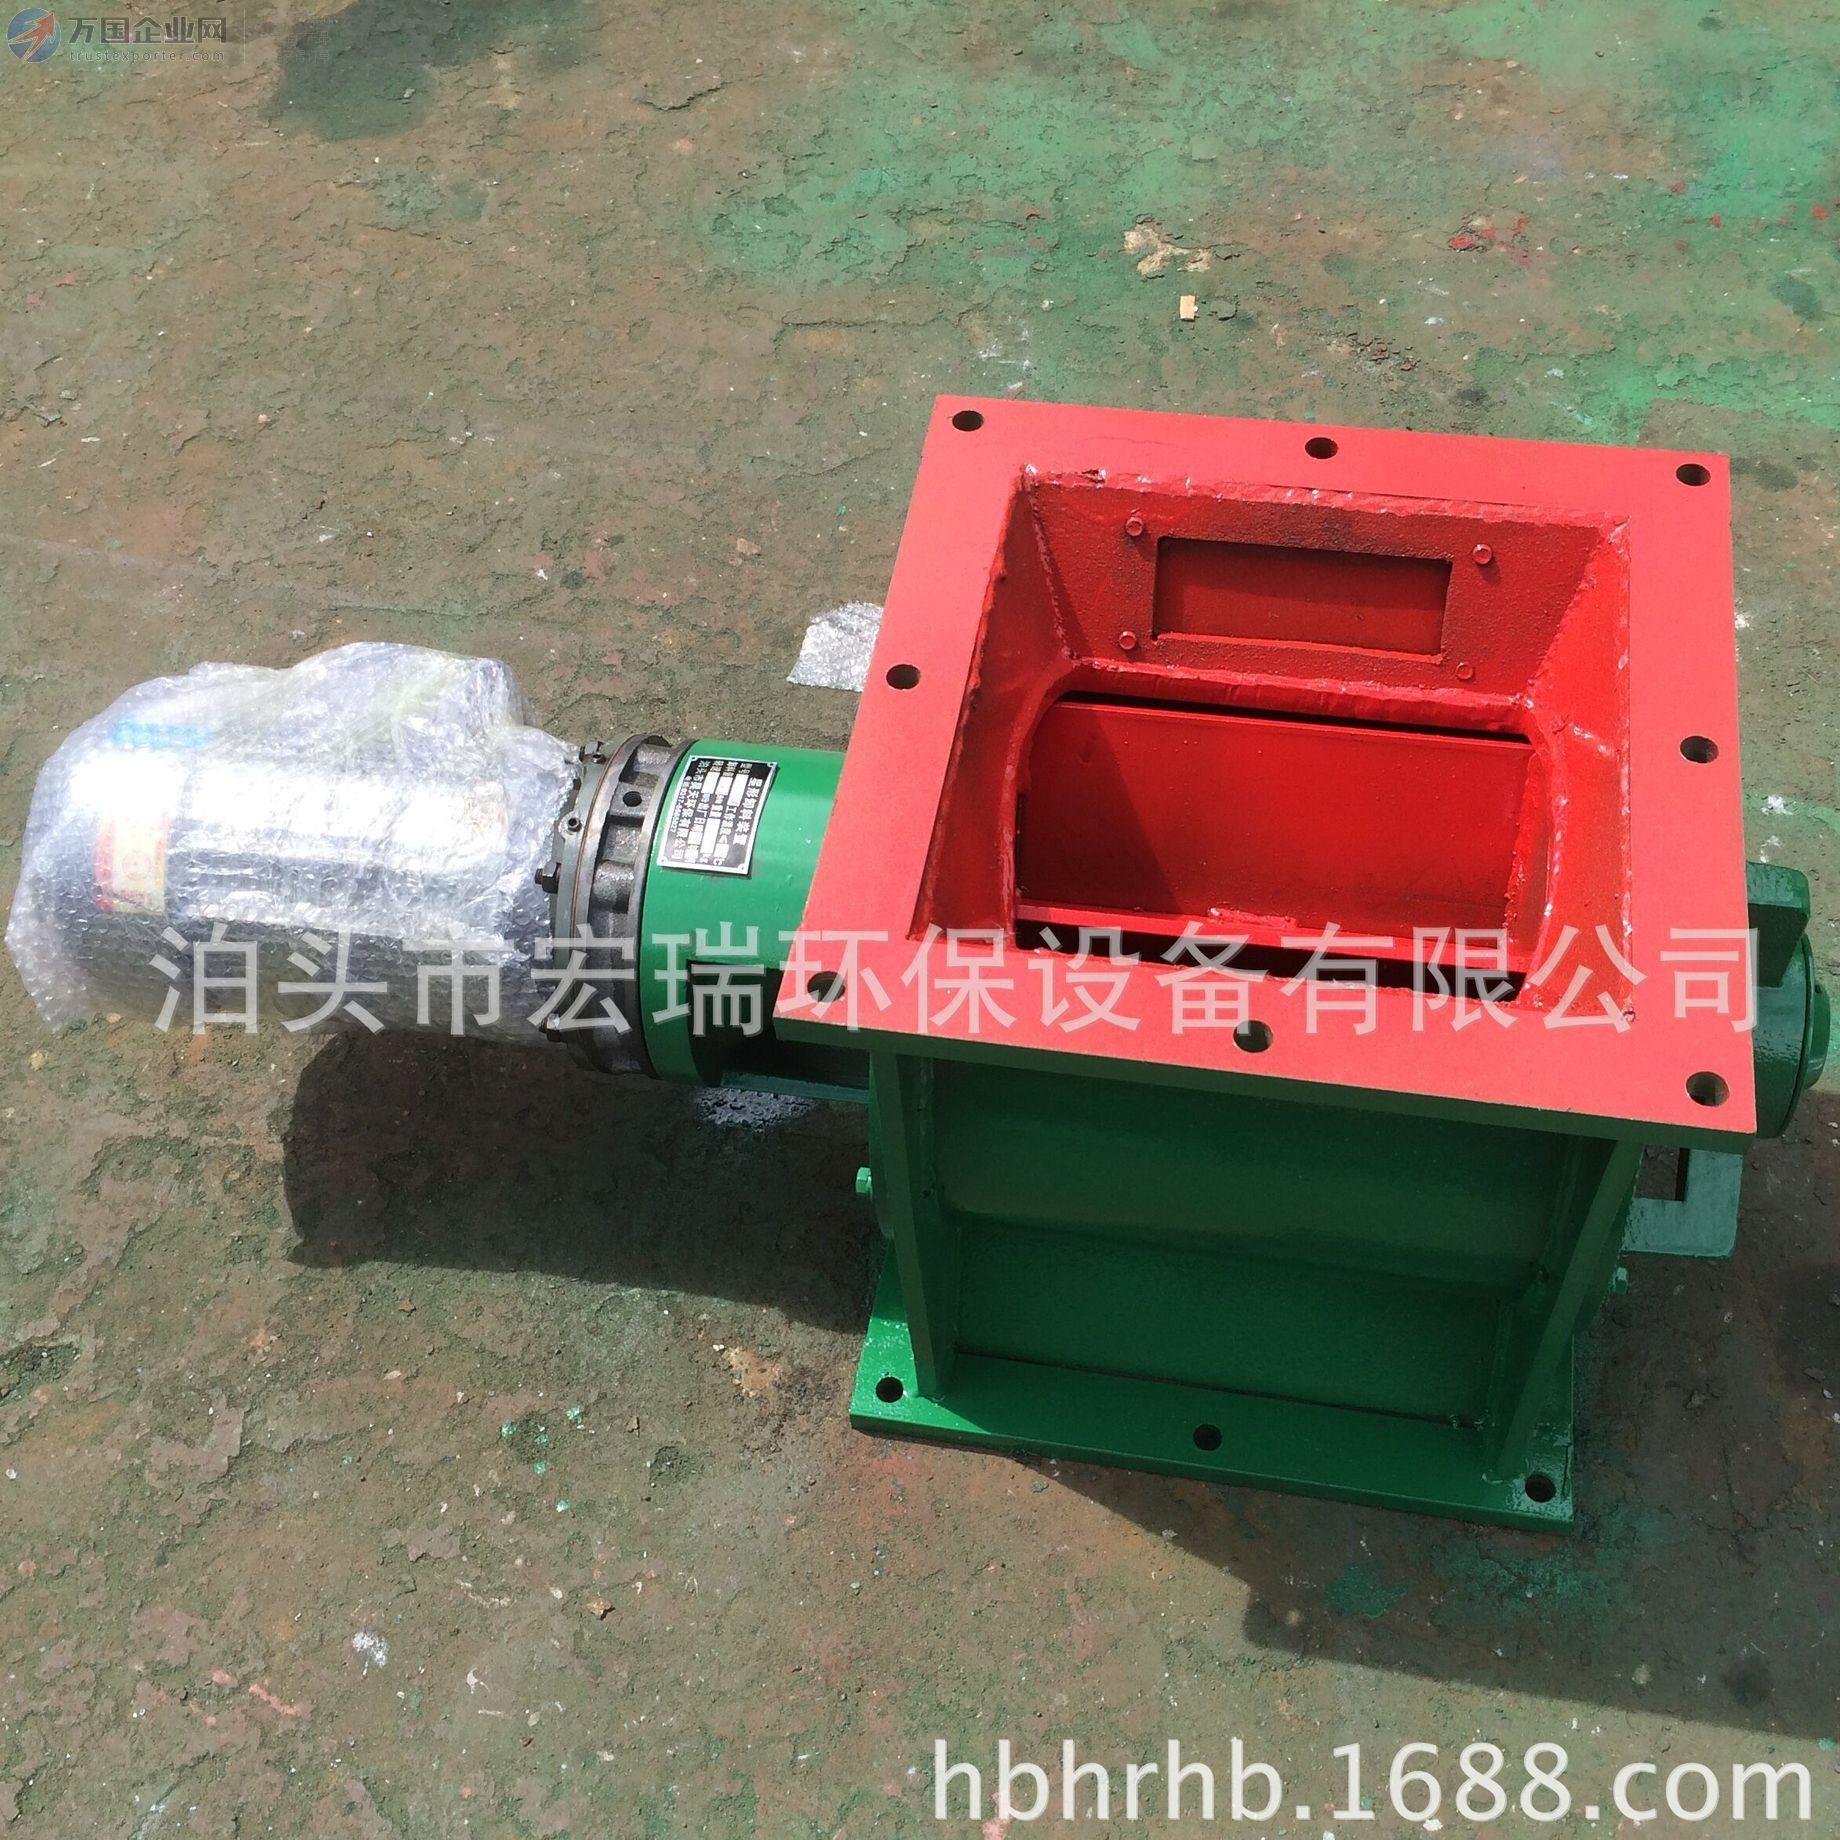 YJZQ-J20W碳钢手动高压液压球阀